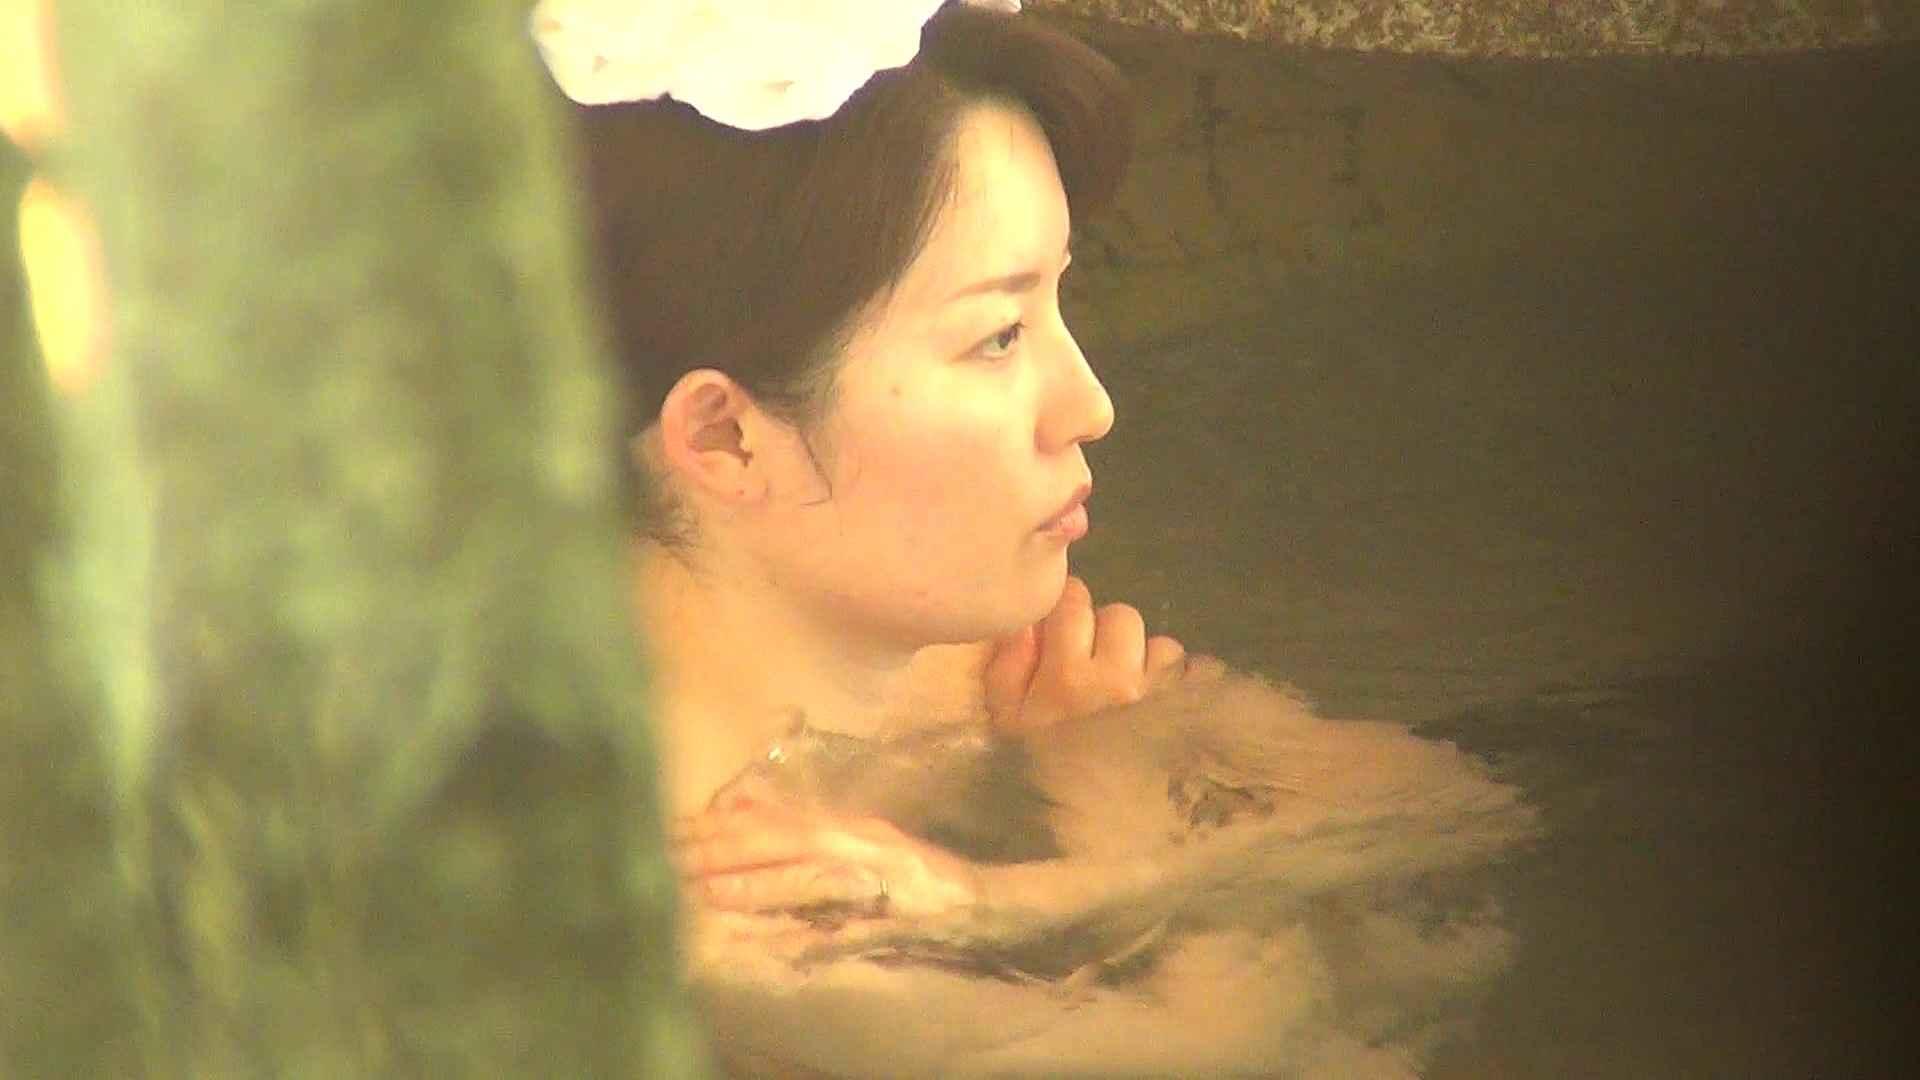 Aquaな露天風呂Vol.301 OLのエロ生活 すけべAV動画紹介 112連発 95